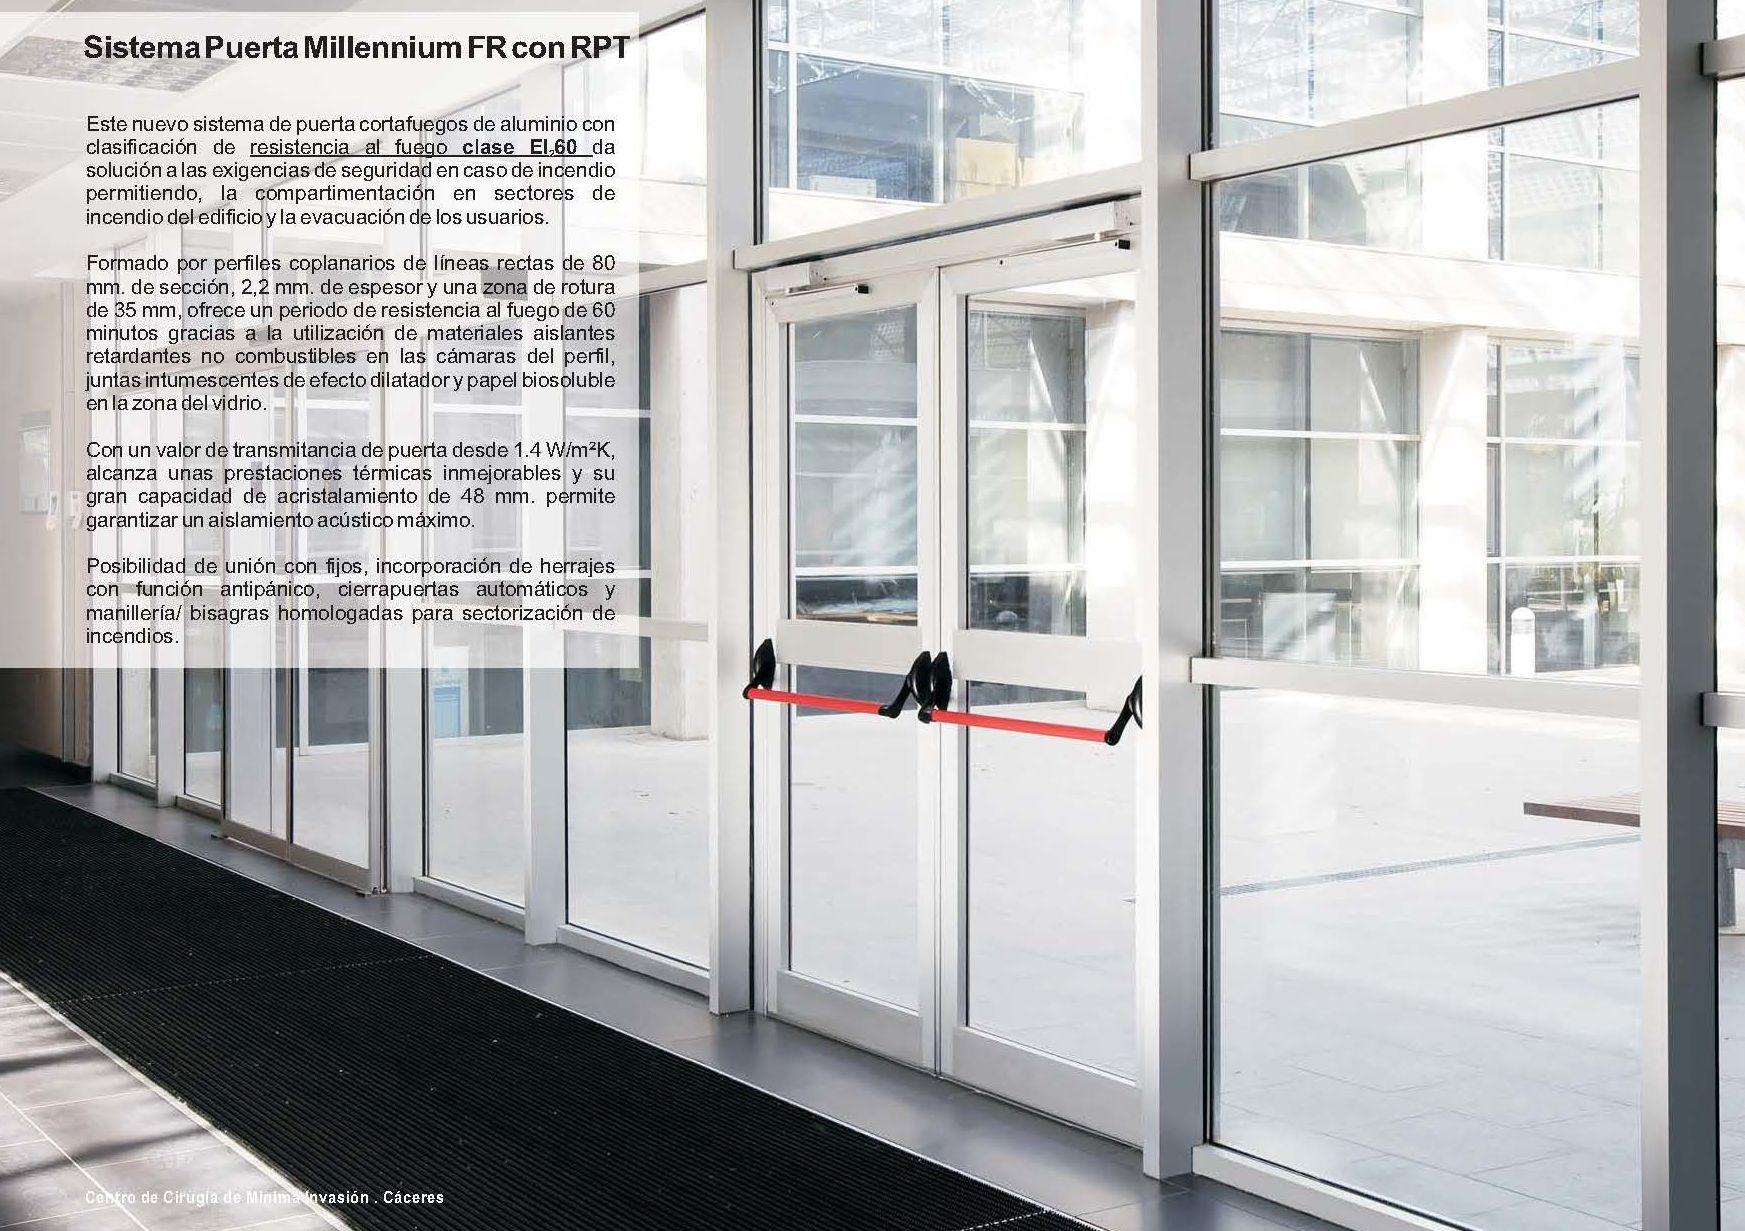 Puerta Millennium FR RPT: Catálogo de Jgmaluminio